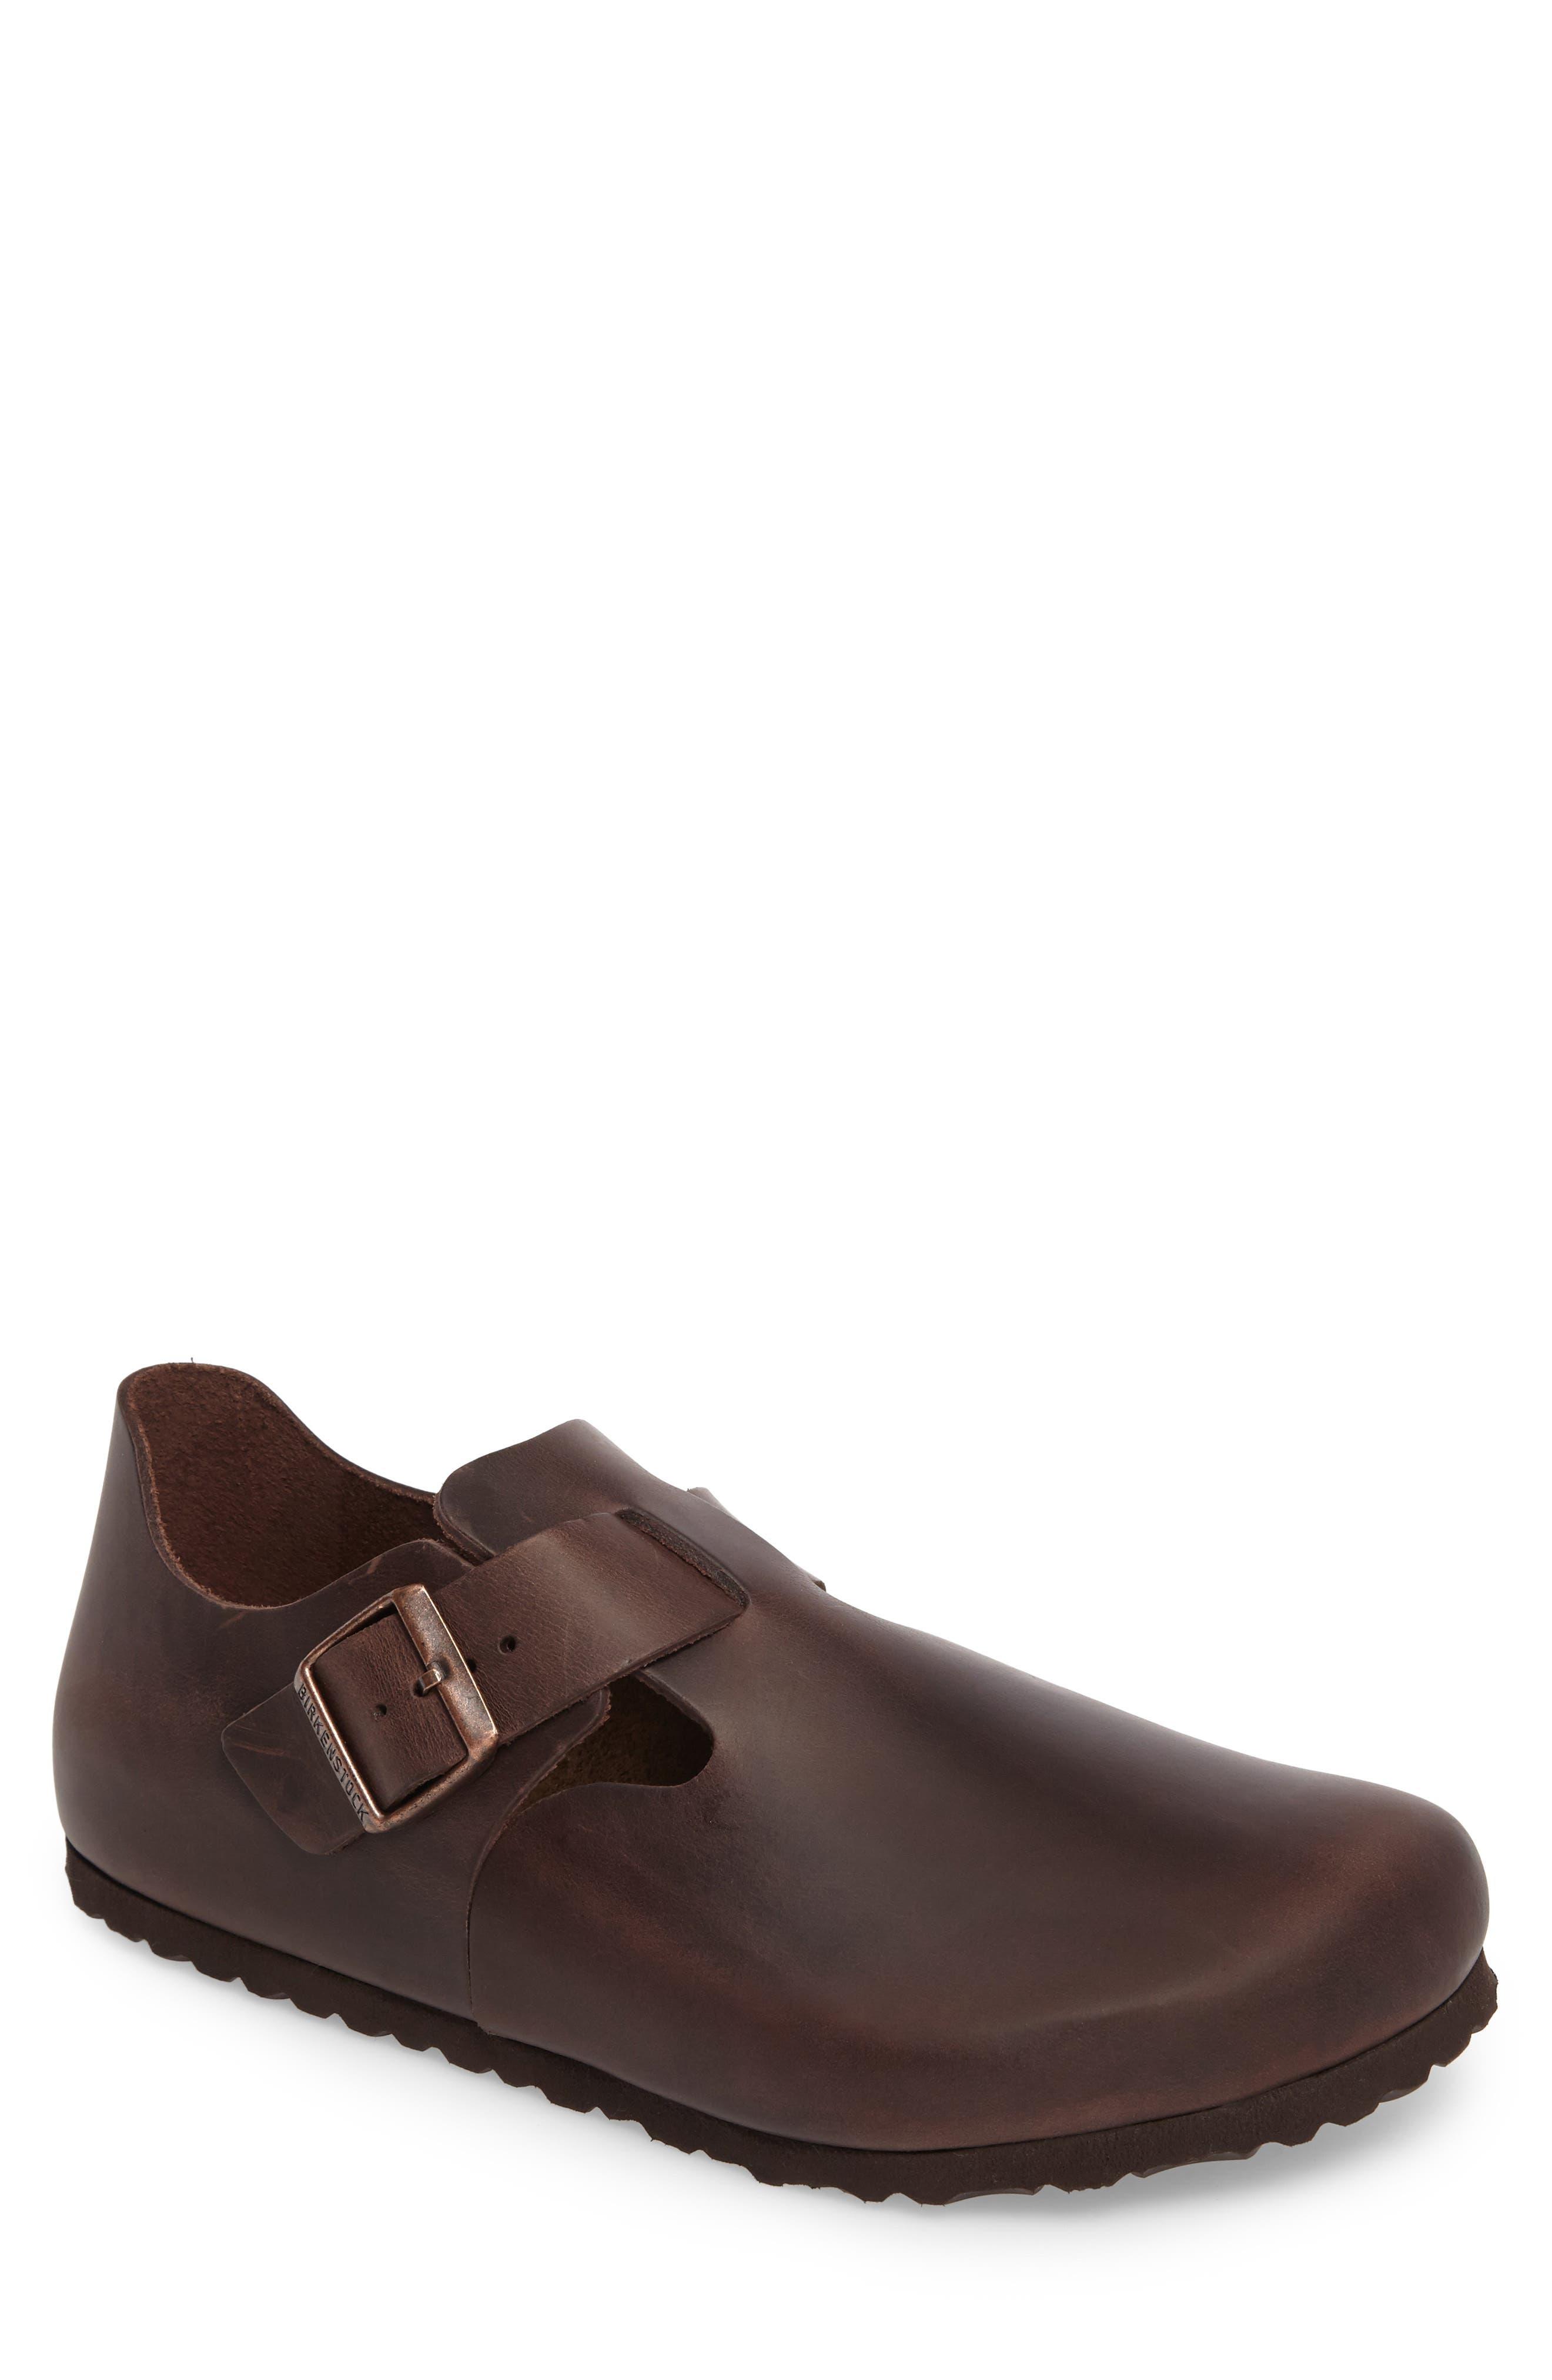 London Habana Slip-On,                         Main,                         color, Brown